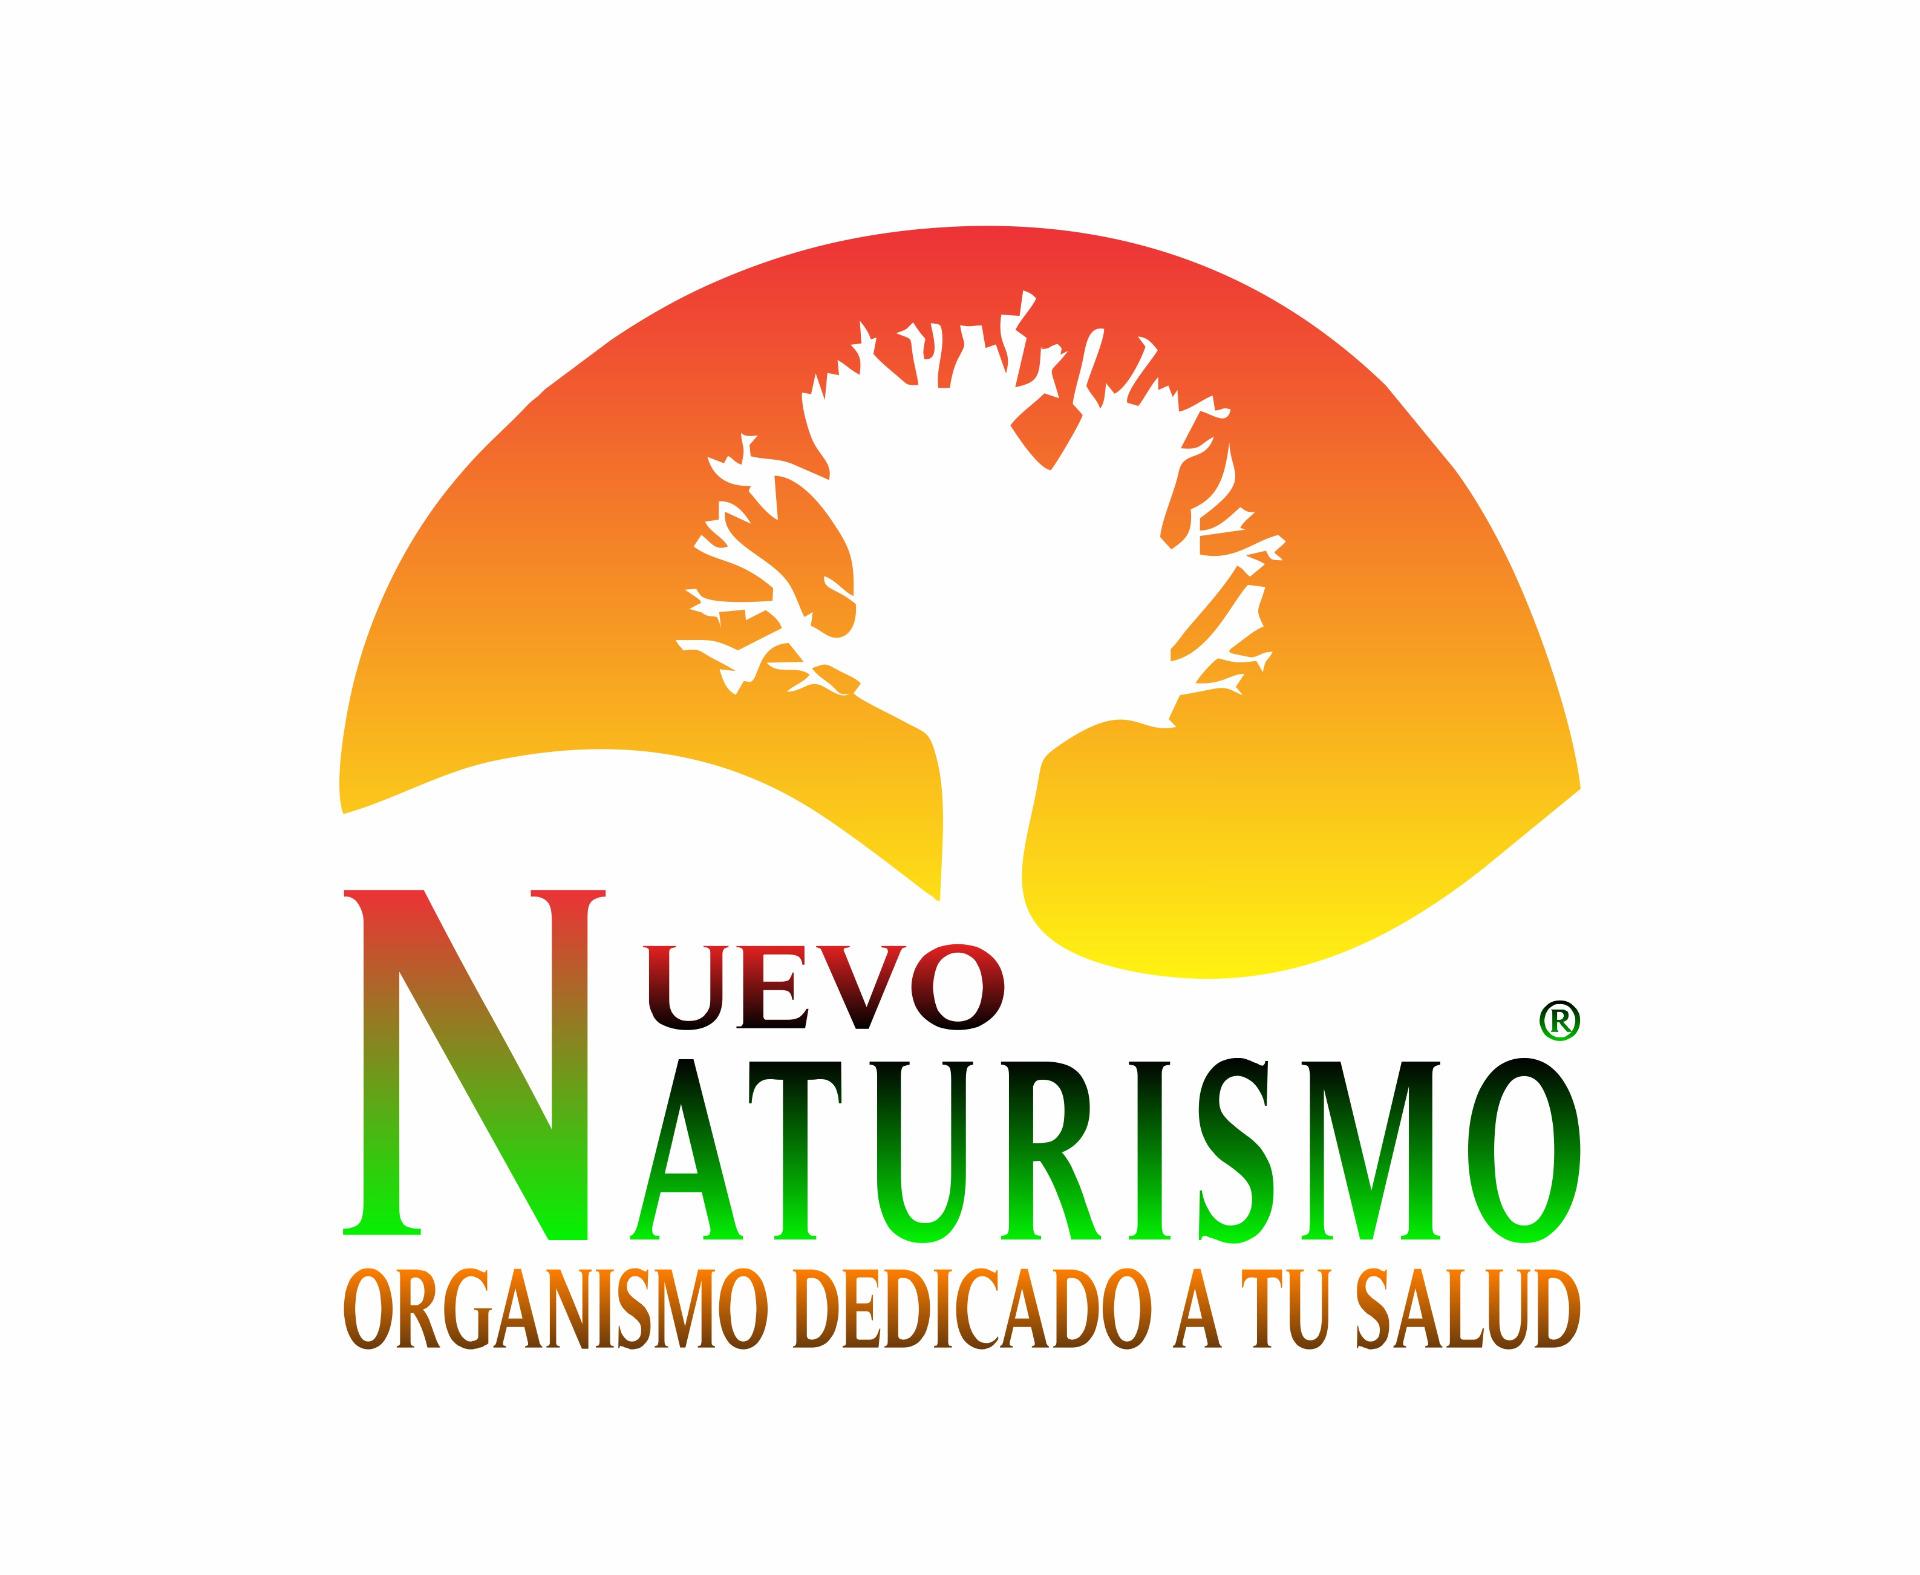 NUEVO NATURISMO